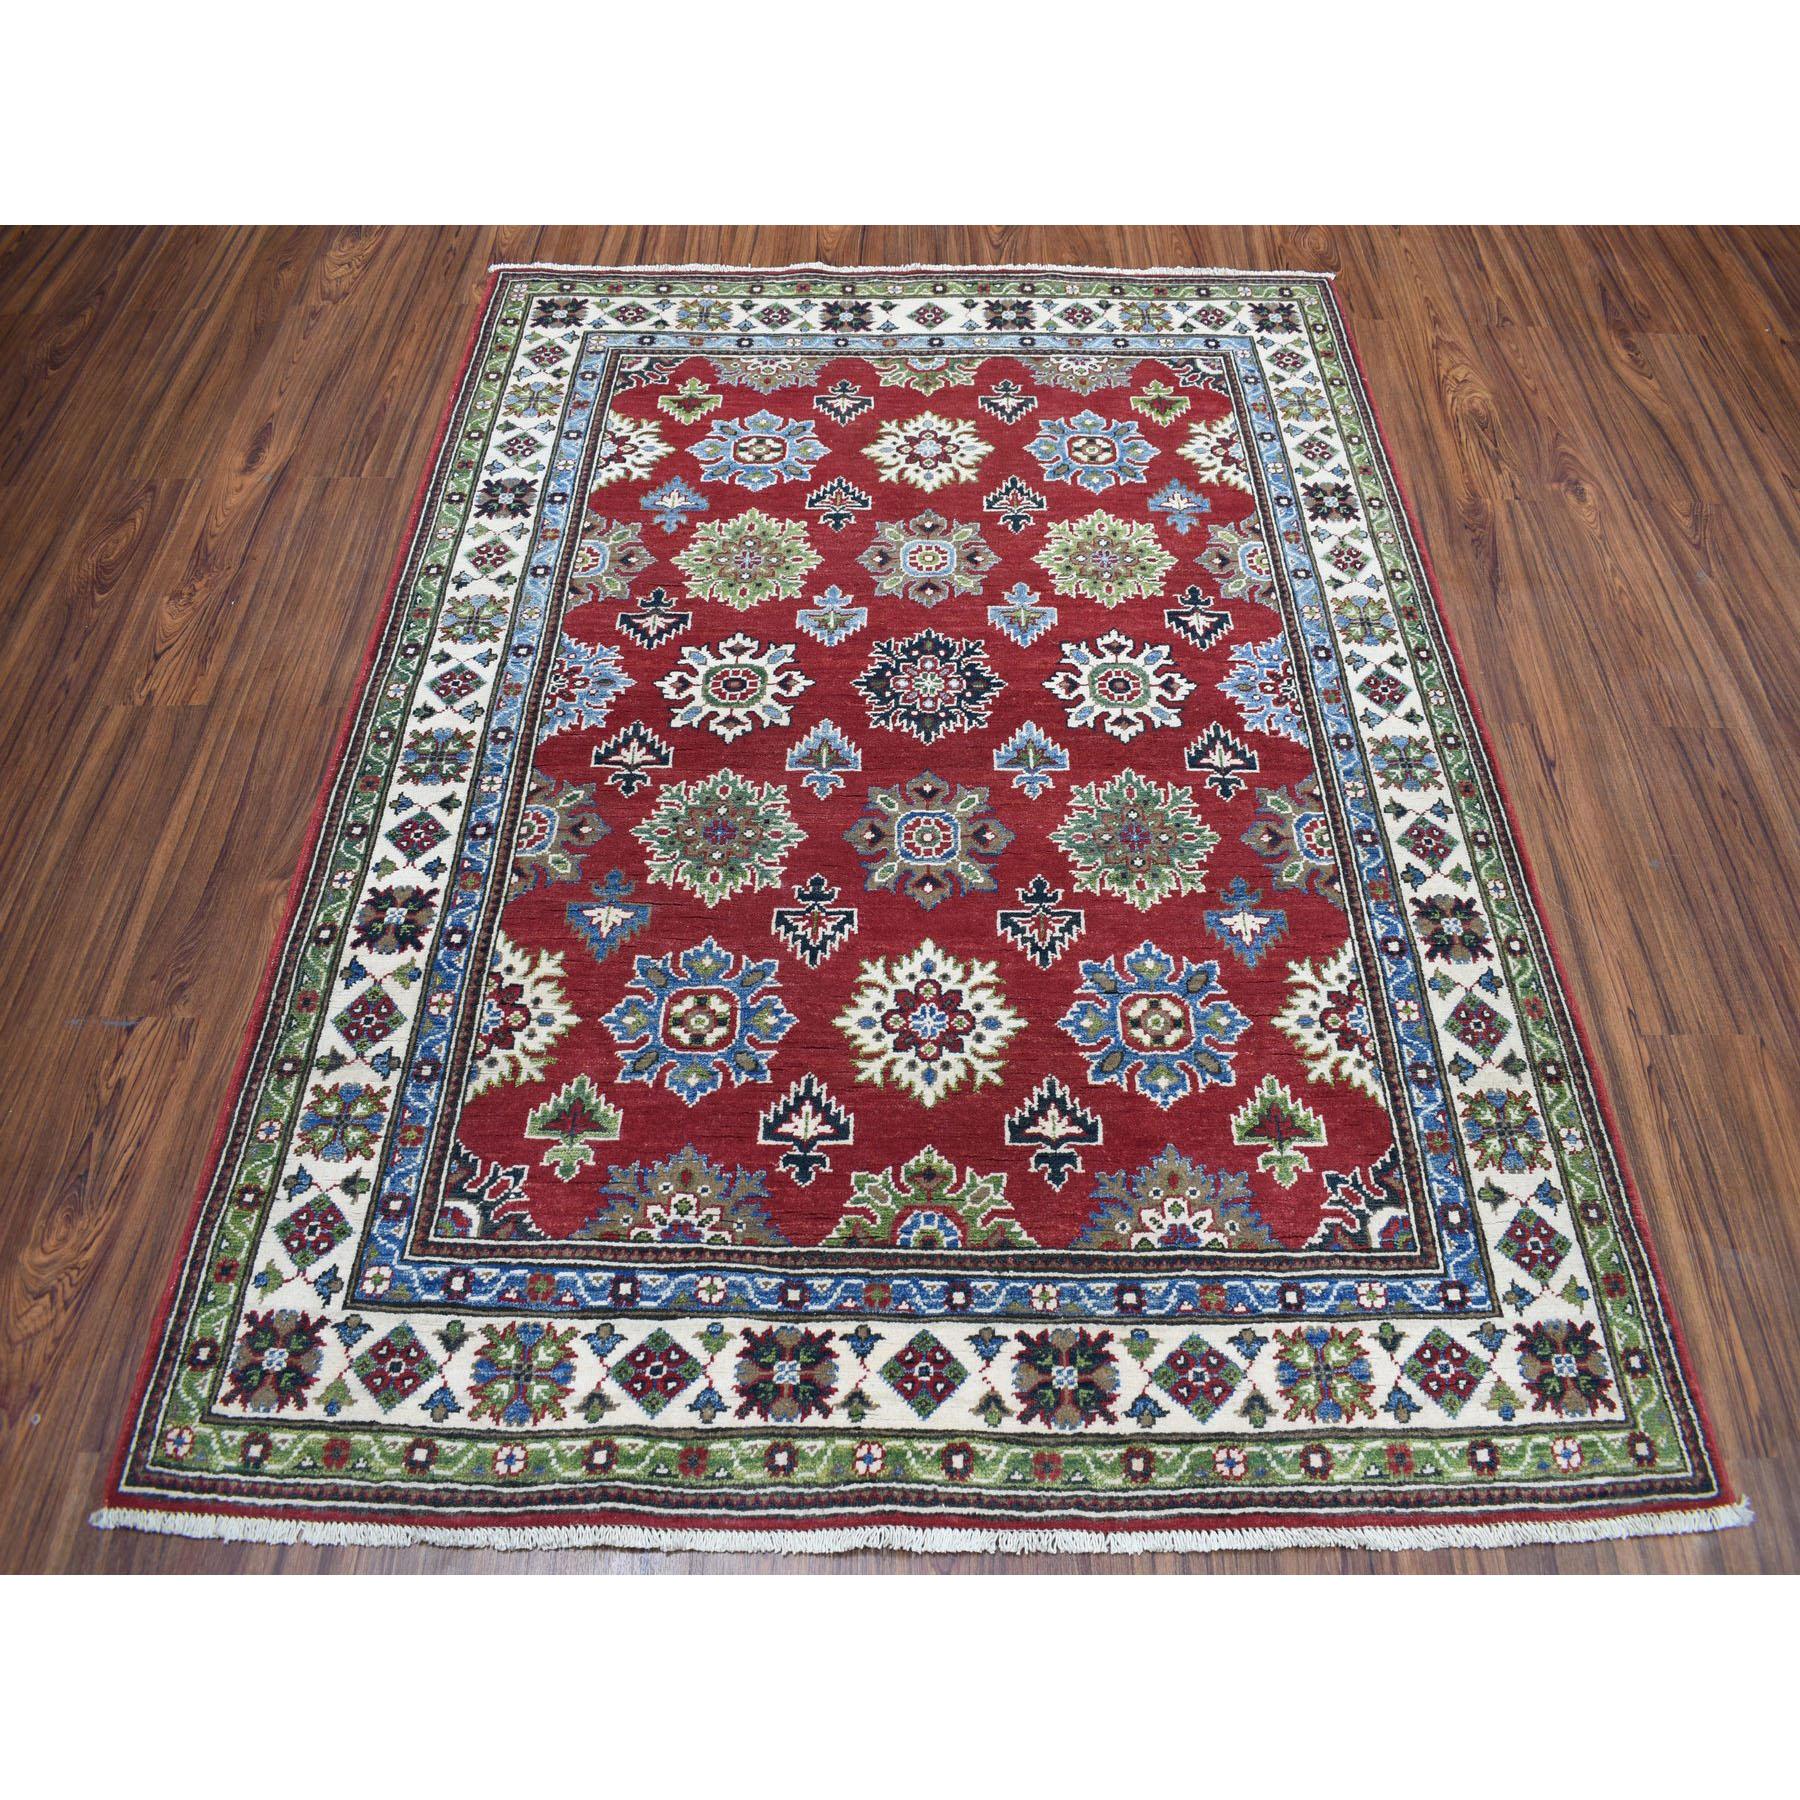 5-x6-5  Red Geometric Design Kazak Pure Wool Hand-Knotted Oriental Rug